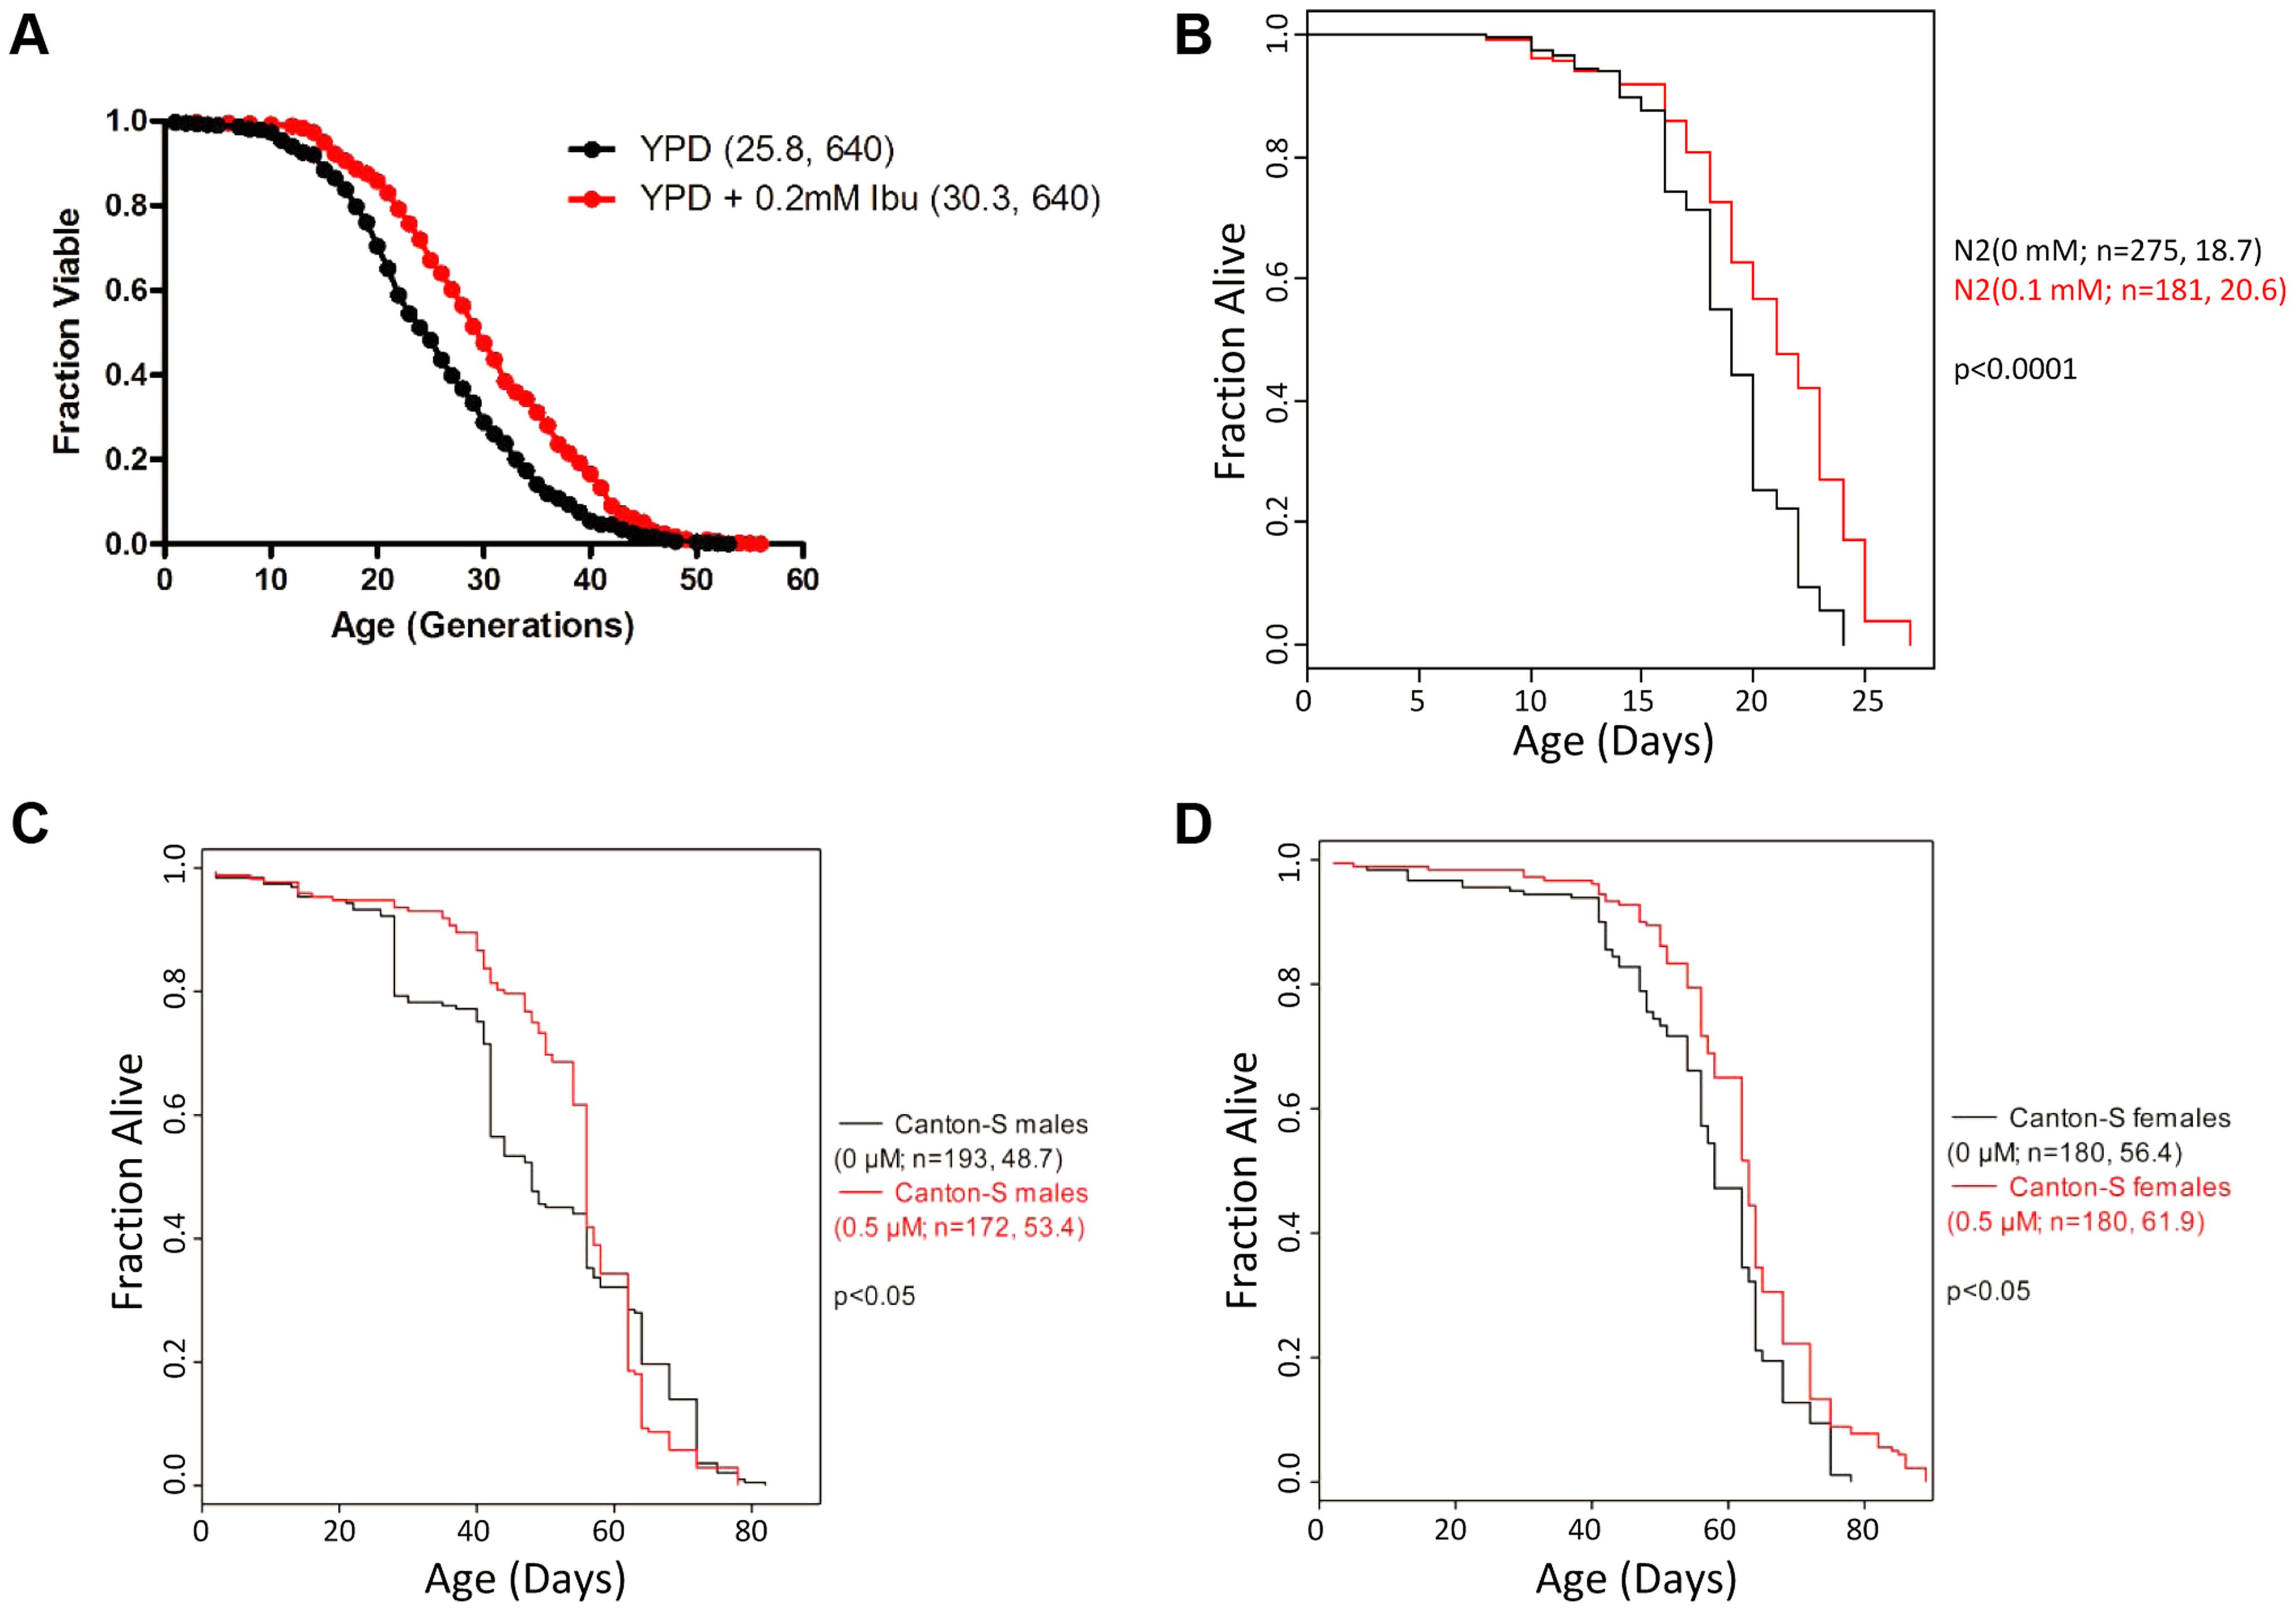 Ibuprofen extends the lifespan of <i>S. cerevisiae</i>, <i>C. elegans</i> and <i>D. melanogaster</i>.